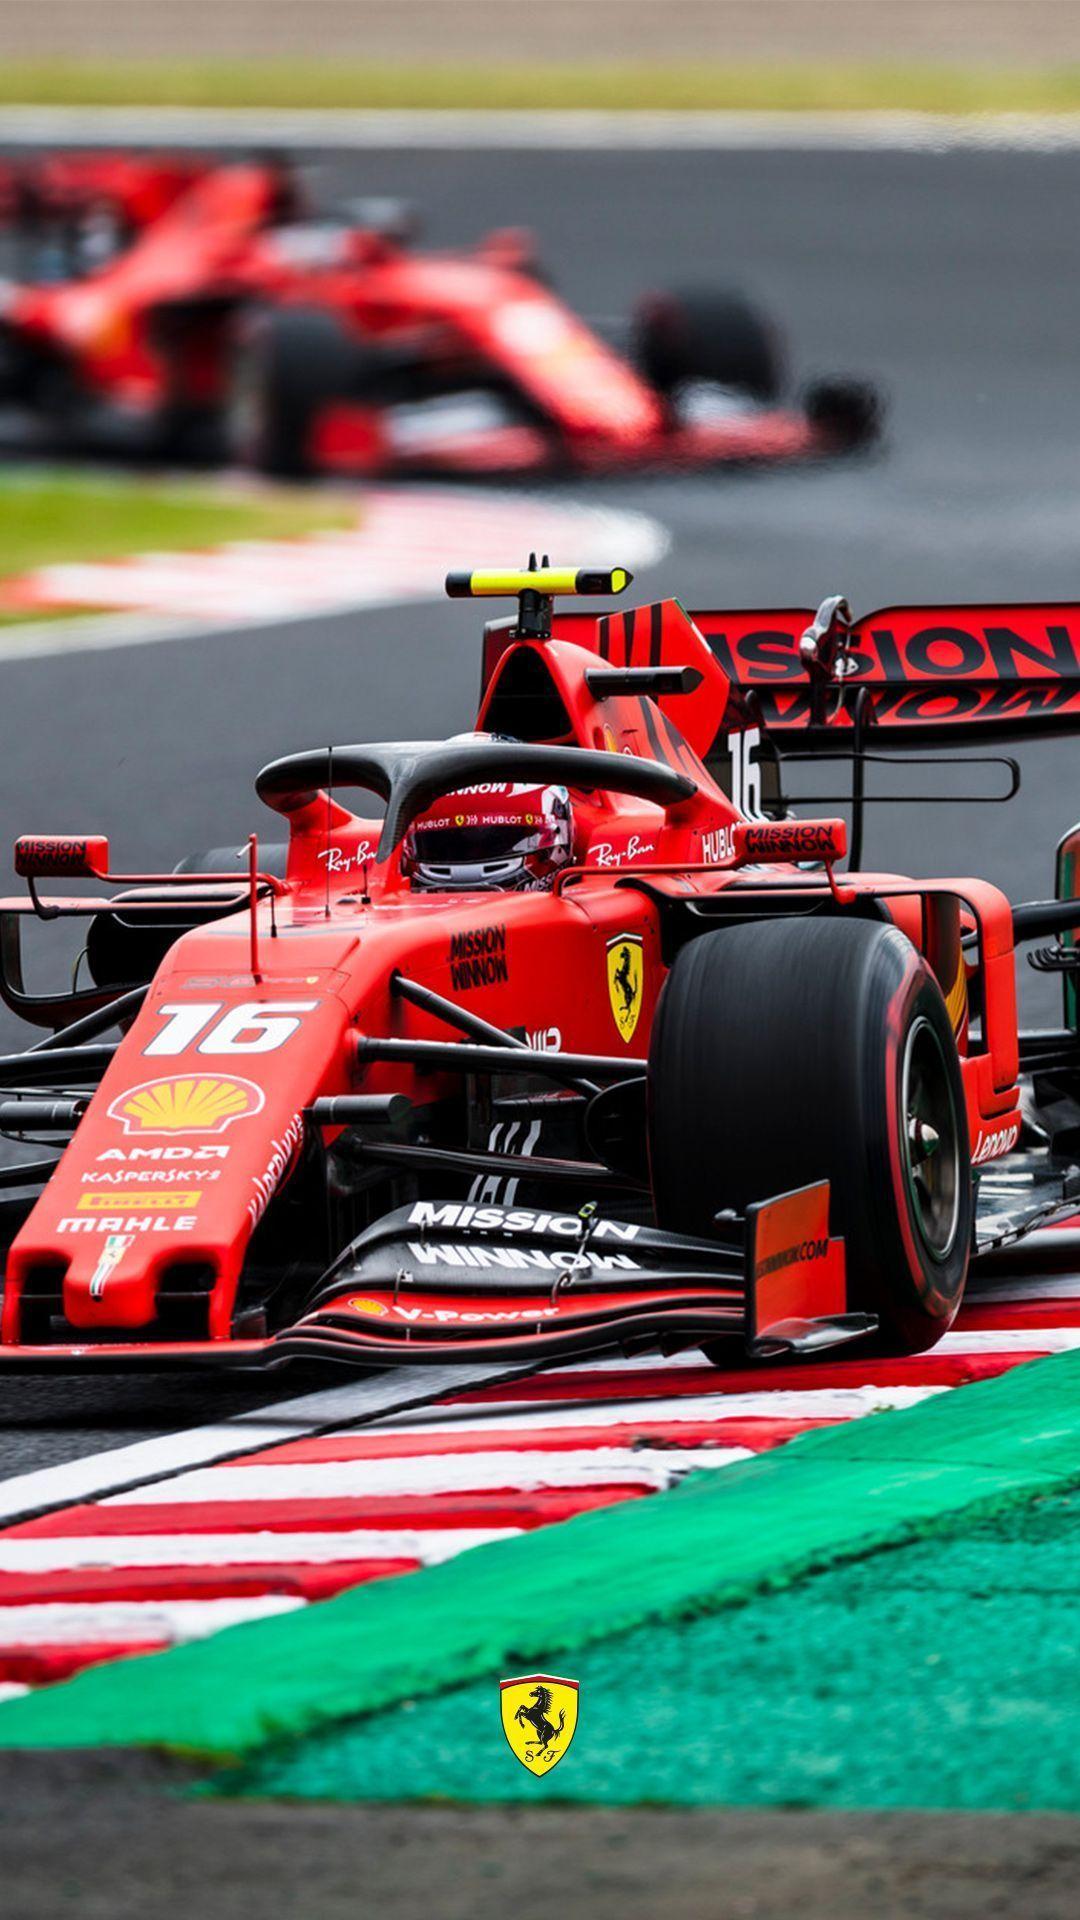 Auto Racing Torta Formula Torta Formula 1 Carro De Formula 1 Formula 1 Fashion Lewis Hamilton Formula 1 Herb In 2020 Formula 1 Car Ferrari Scuderia Ferrari Car